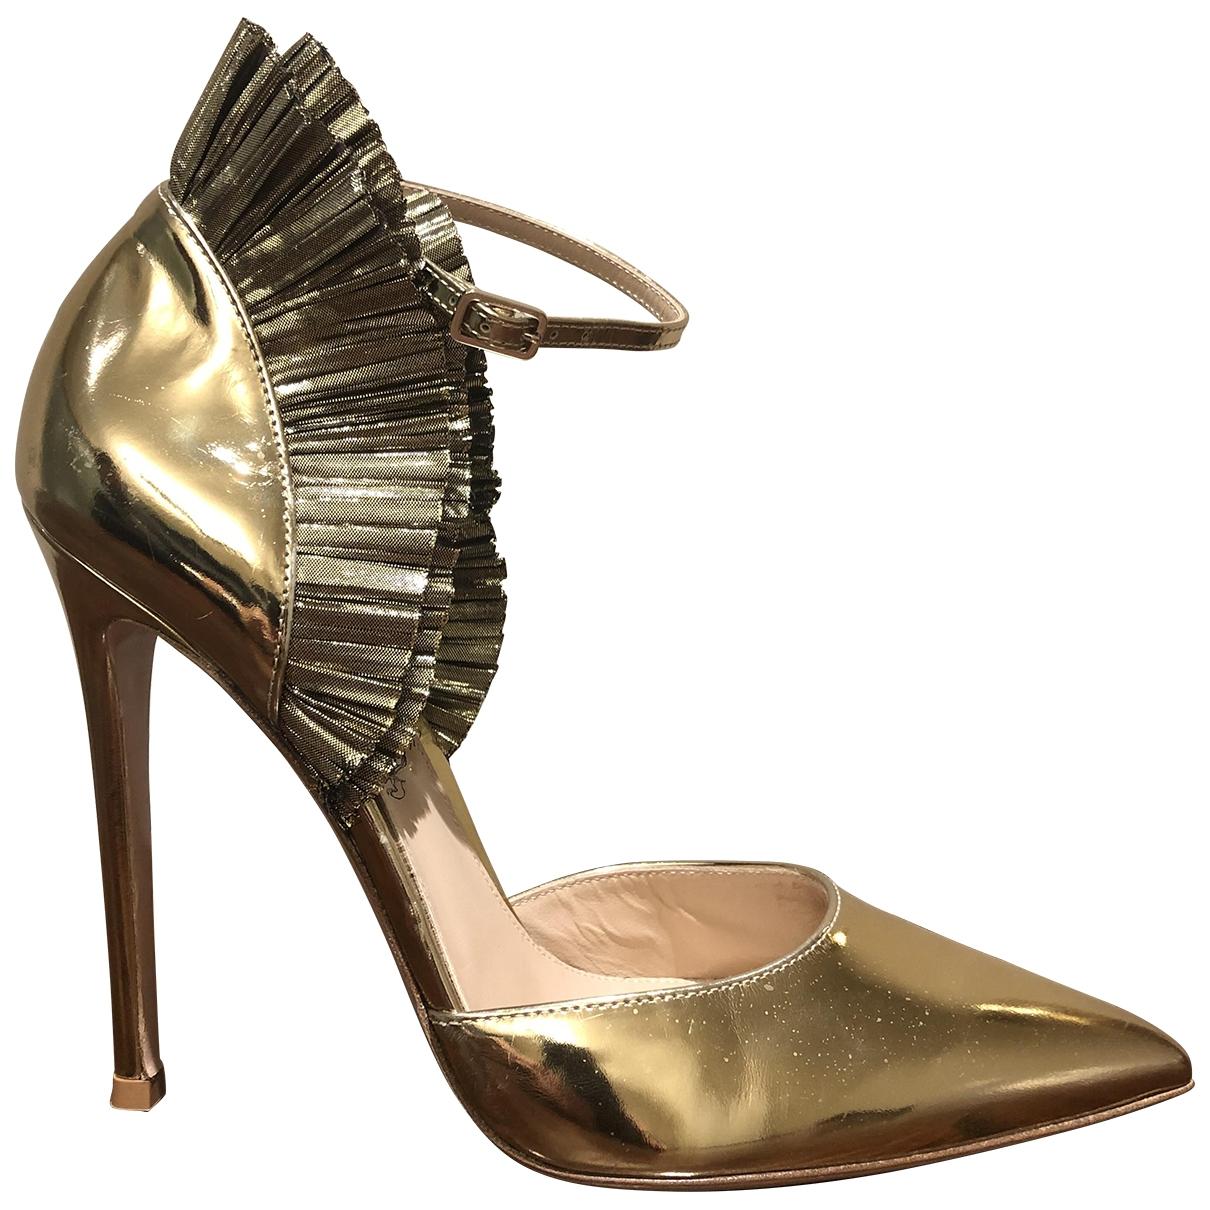 Gianvito Rossi - Escarpins   pour femme en cuir verni - dore